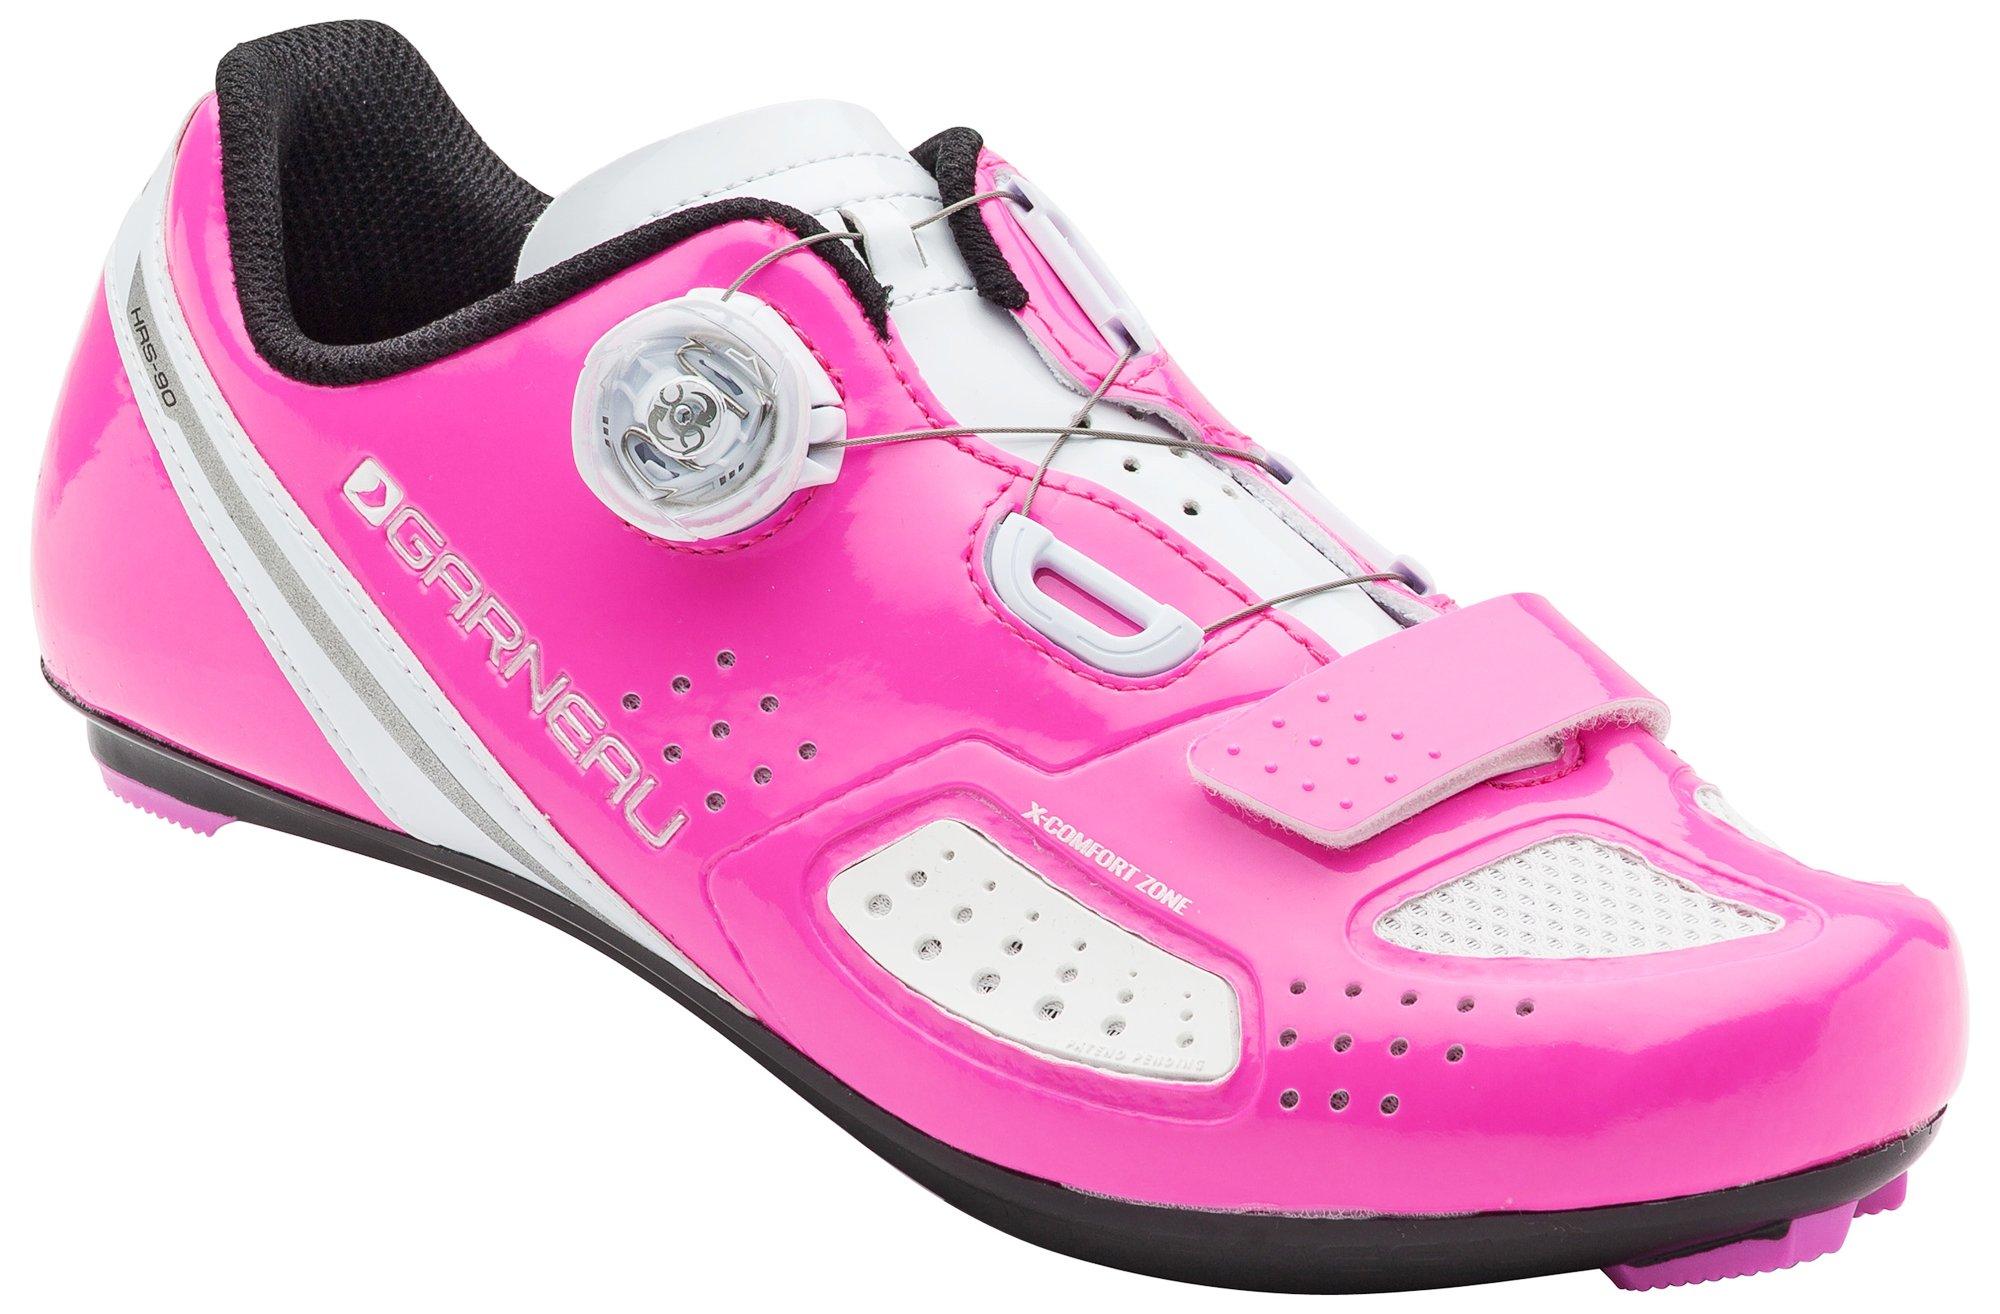 Louis Garneau Women's Ruby 2 Bike Shoes, Pink Glow, 38